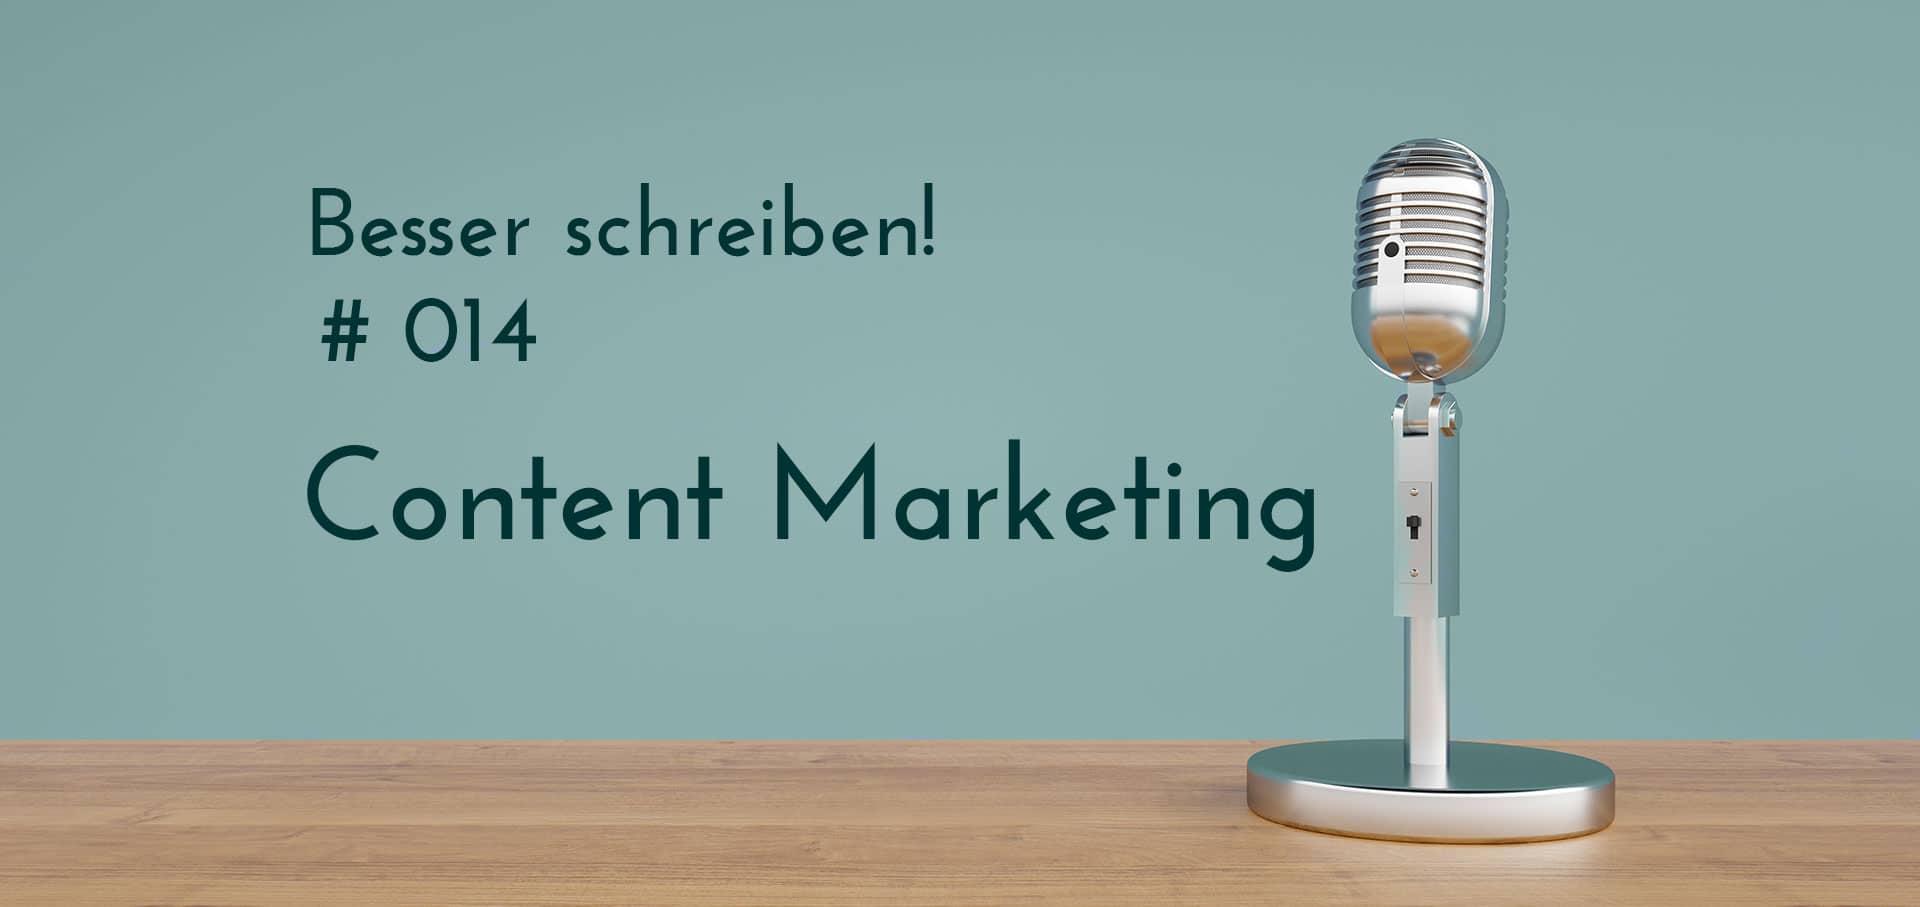 Podcastfolge content marketing